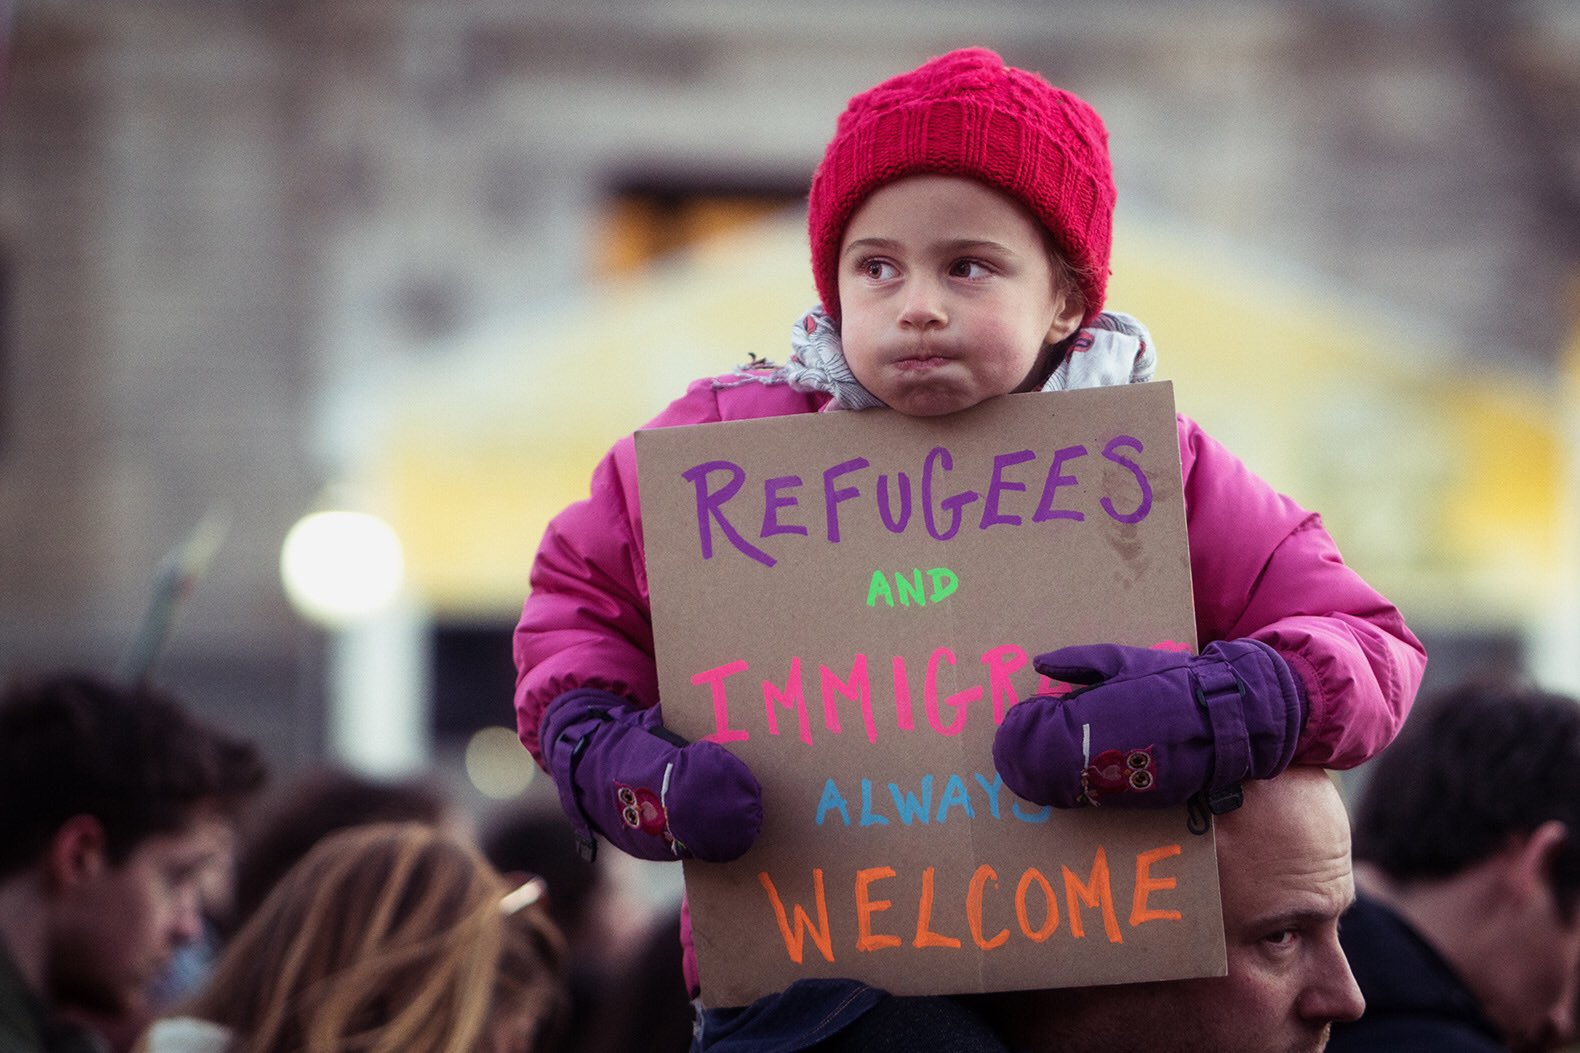 Text REFUGEES to 52886 & stand with refugees! #WithRefugees #UNAatUN @amnestyusa @ircsandiego @UNAUSA #HumanRights #SanDiego https://t.co/kJS7Wl02s9